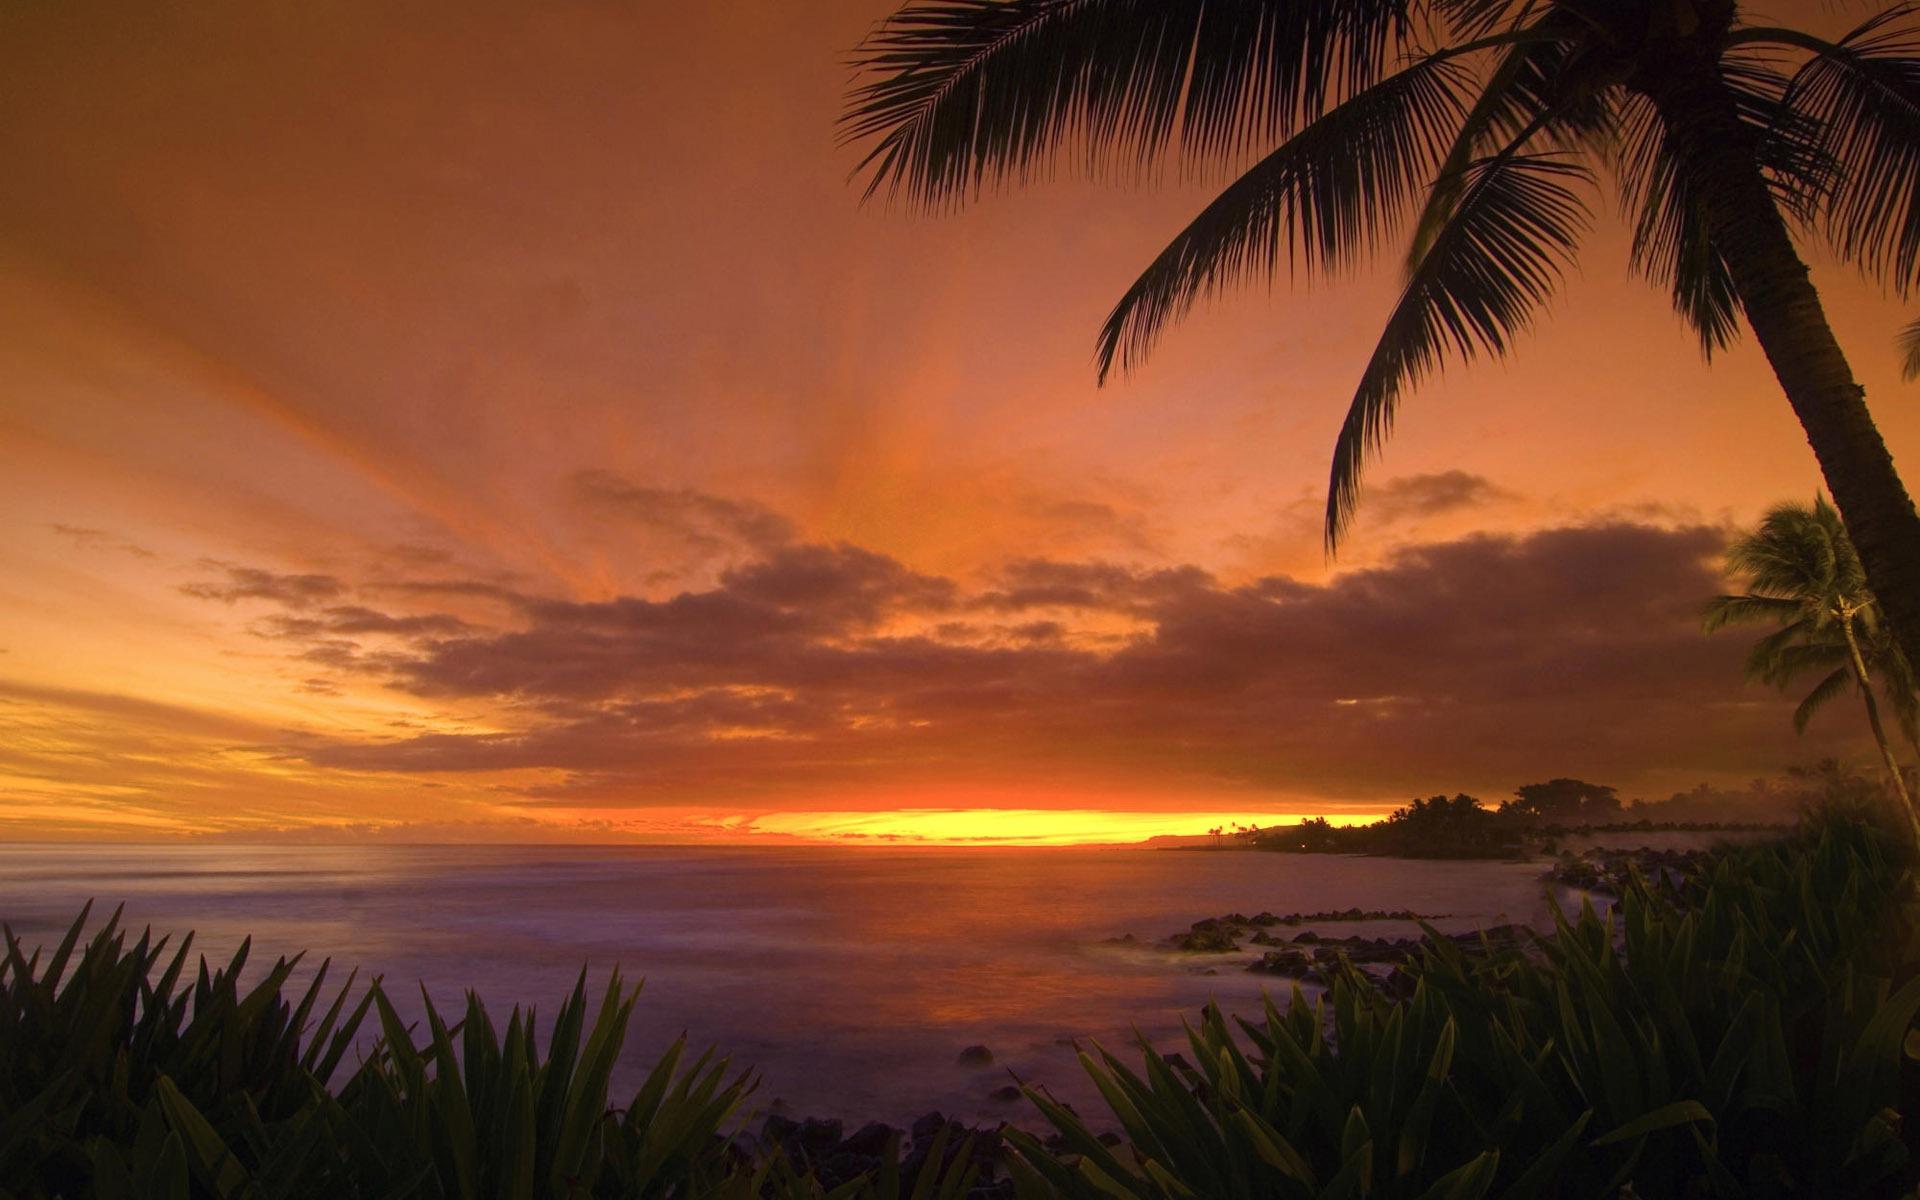 sunset images sunset beach